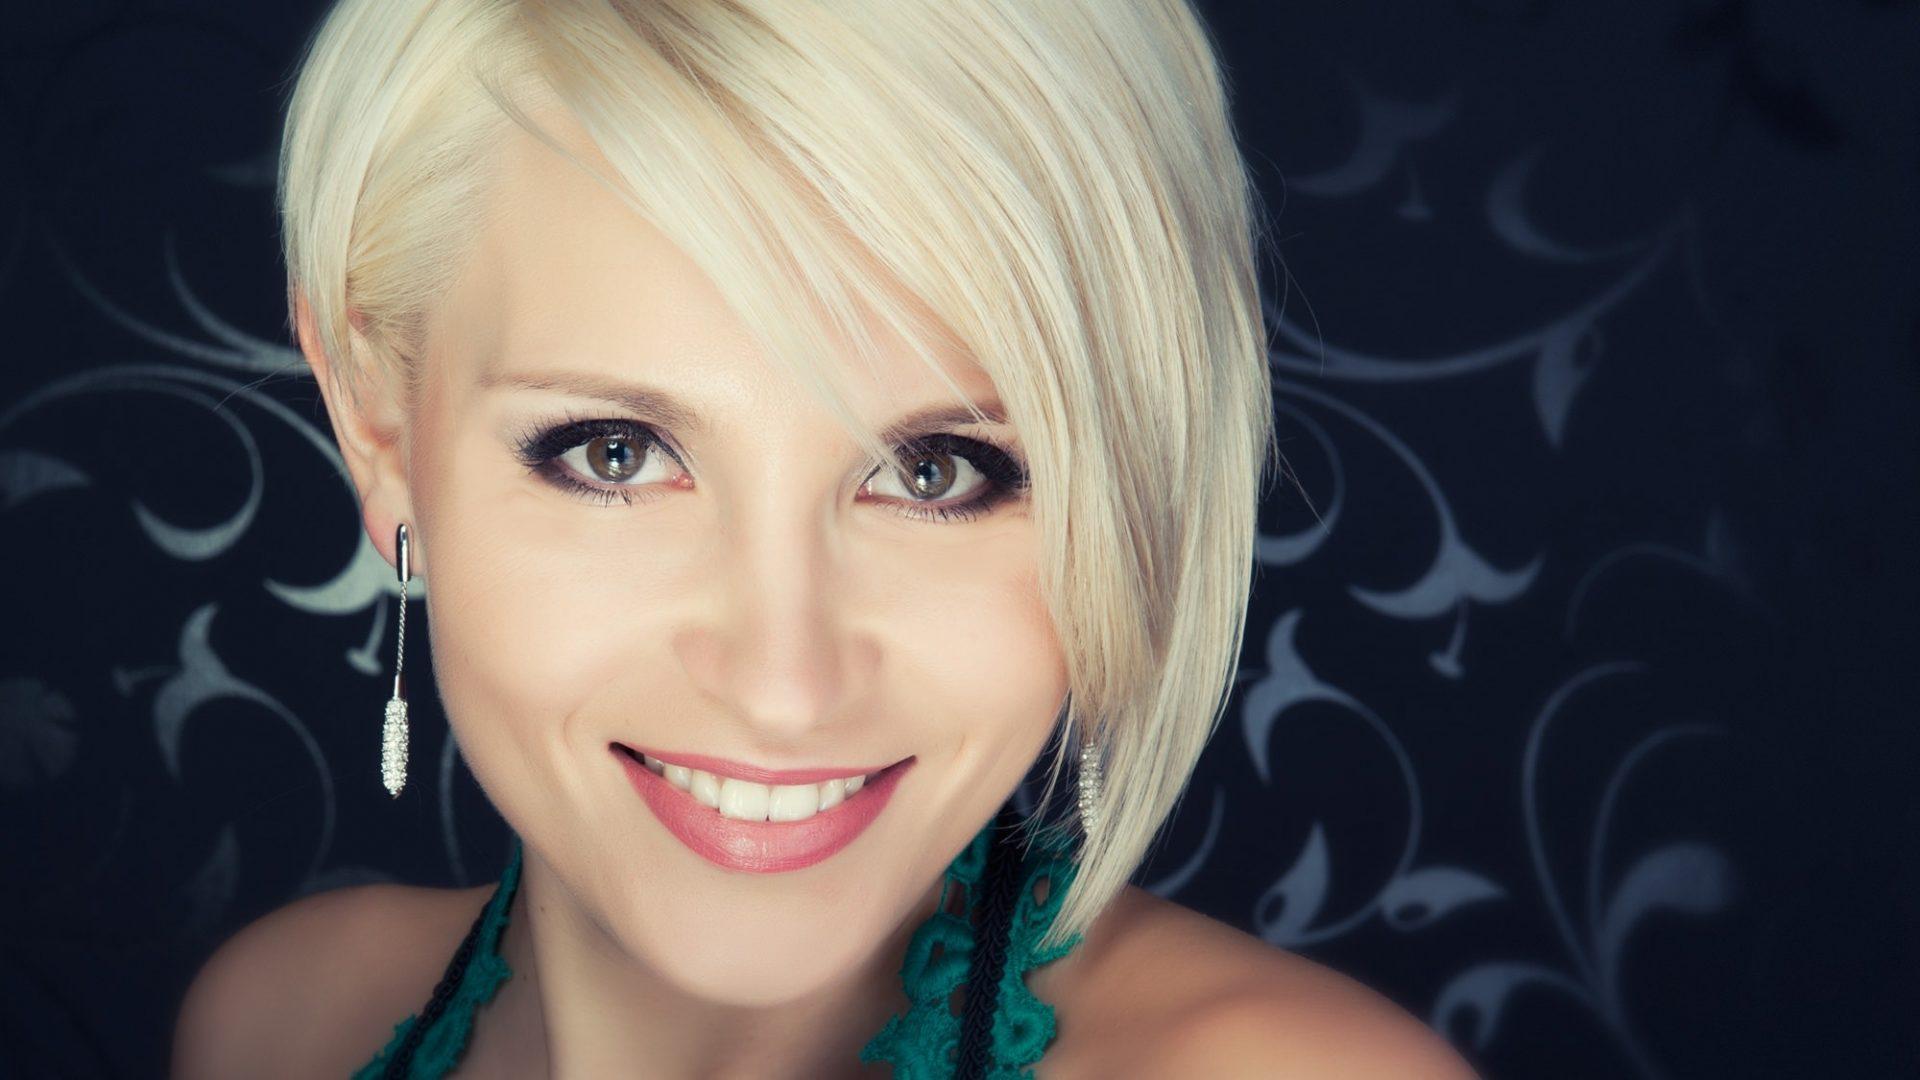 CELLIZ attractive beauty blond